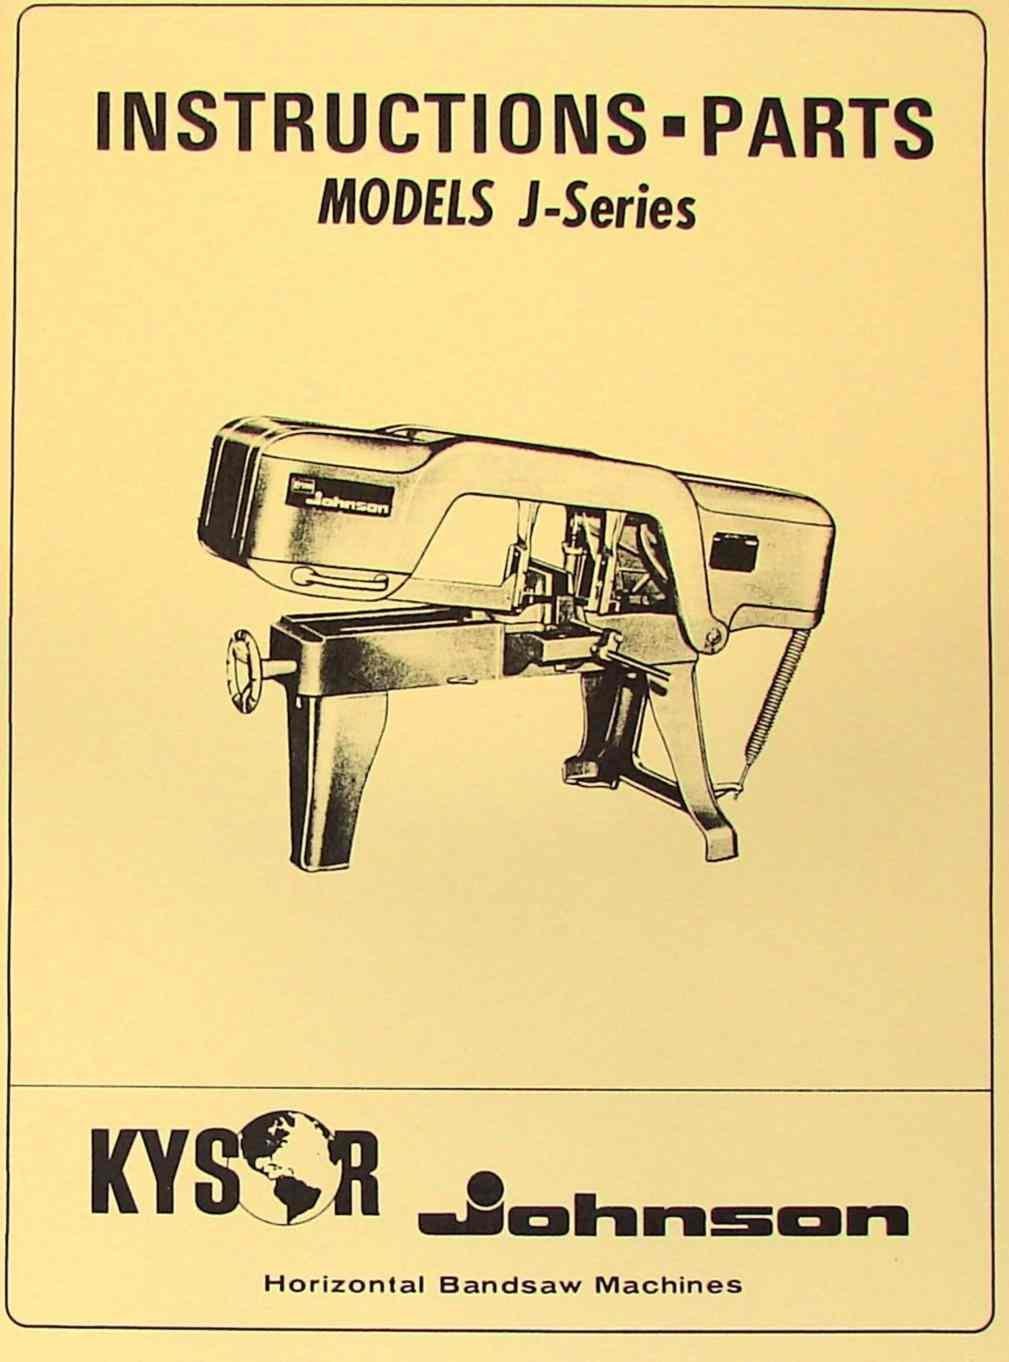 kysor johnson j series horizontal band saw manual misc amazon com rh amazon com 12-Inch Craftsman Band Saw Manual johnson model j bandsaw specs